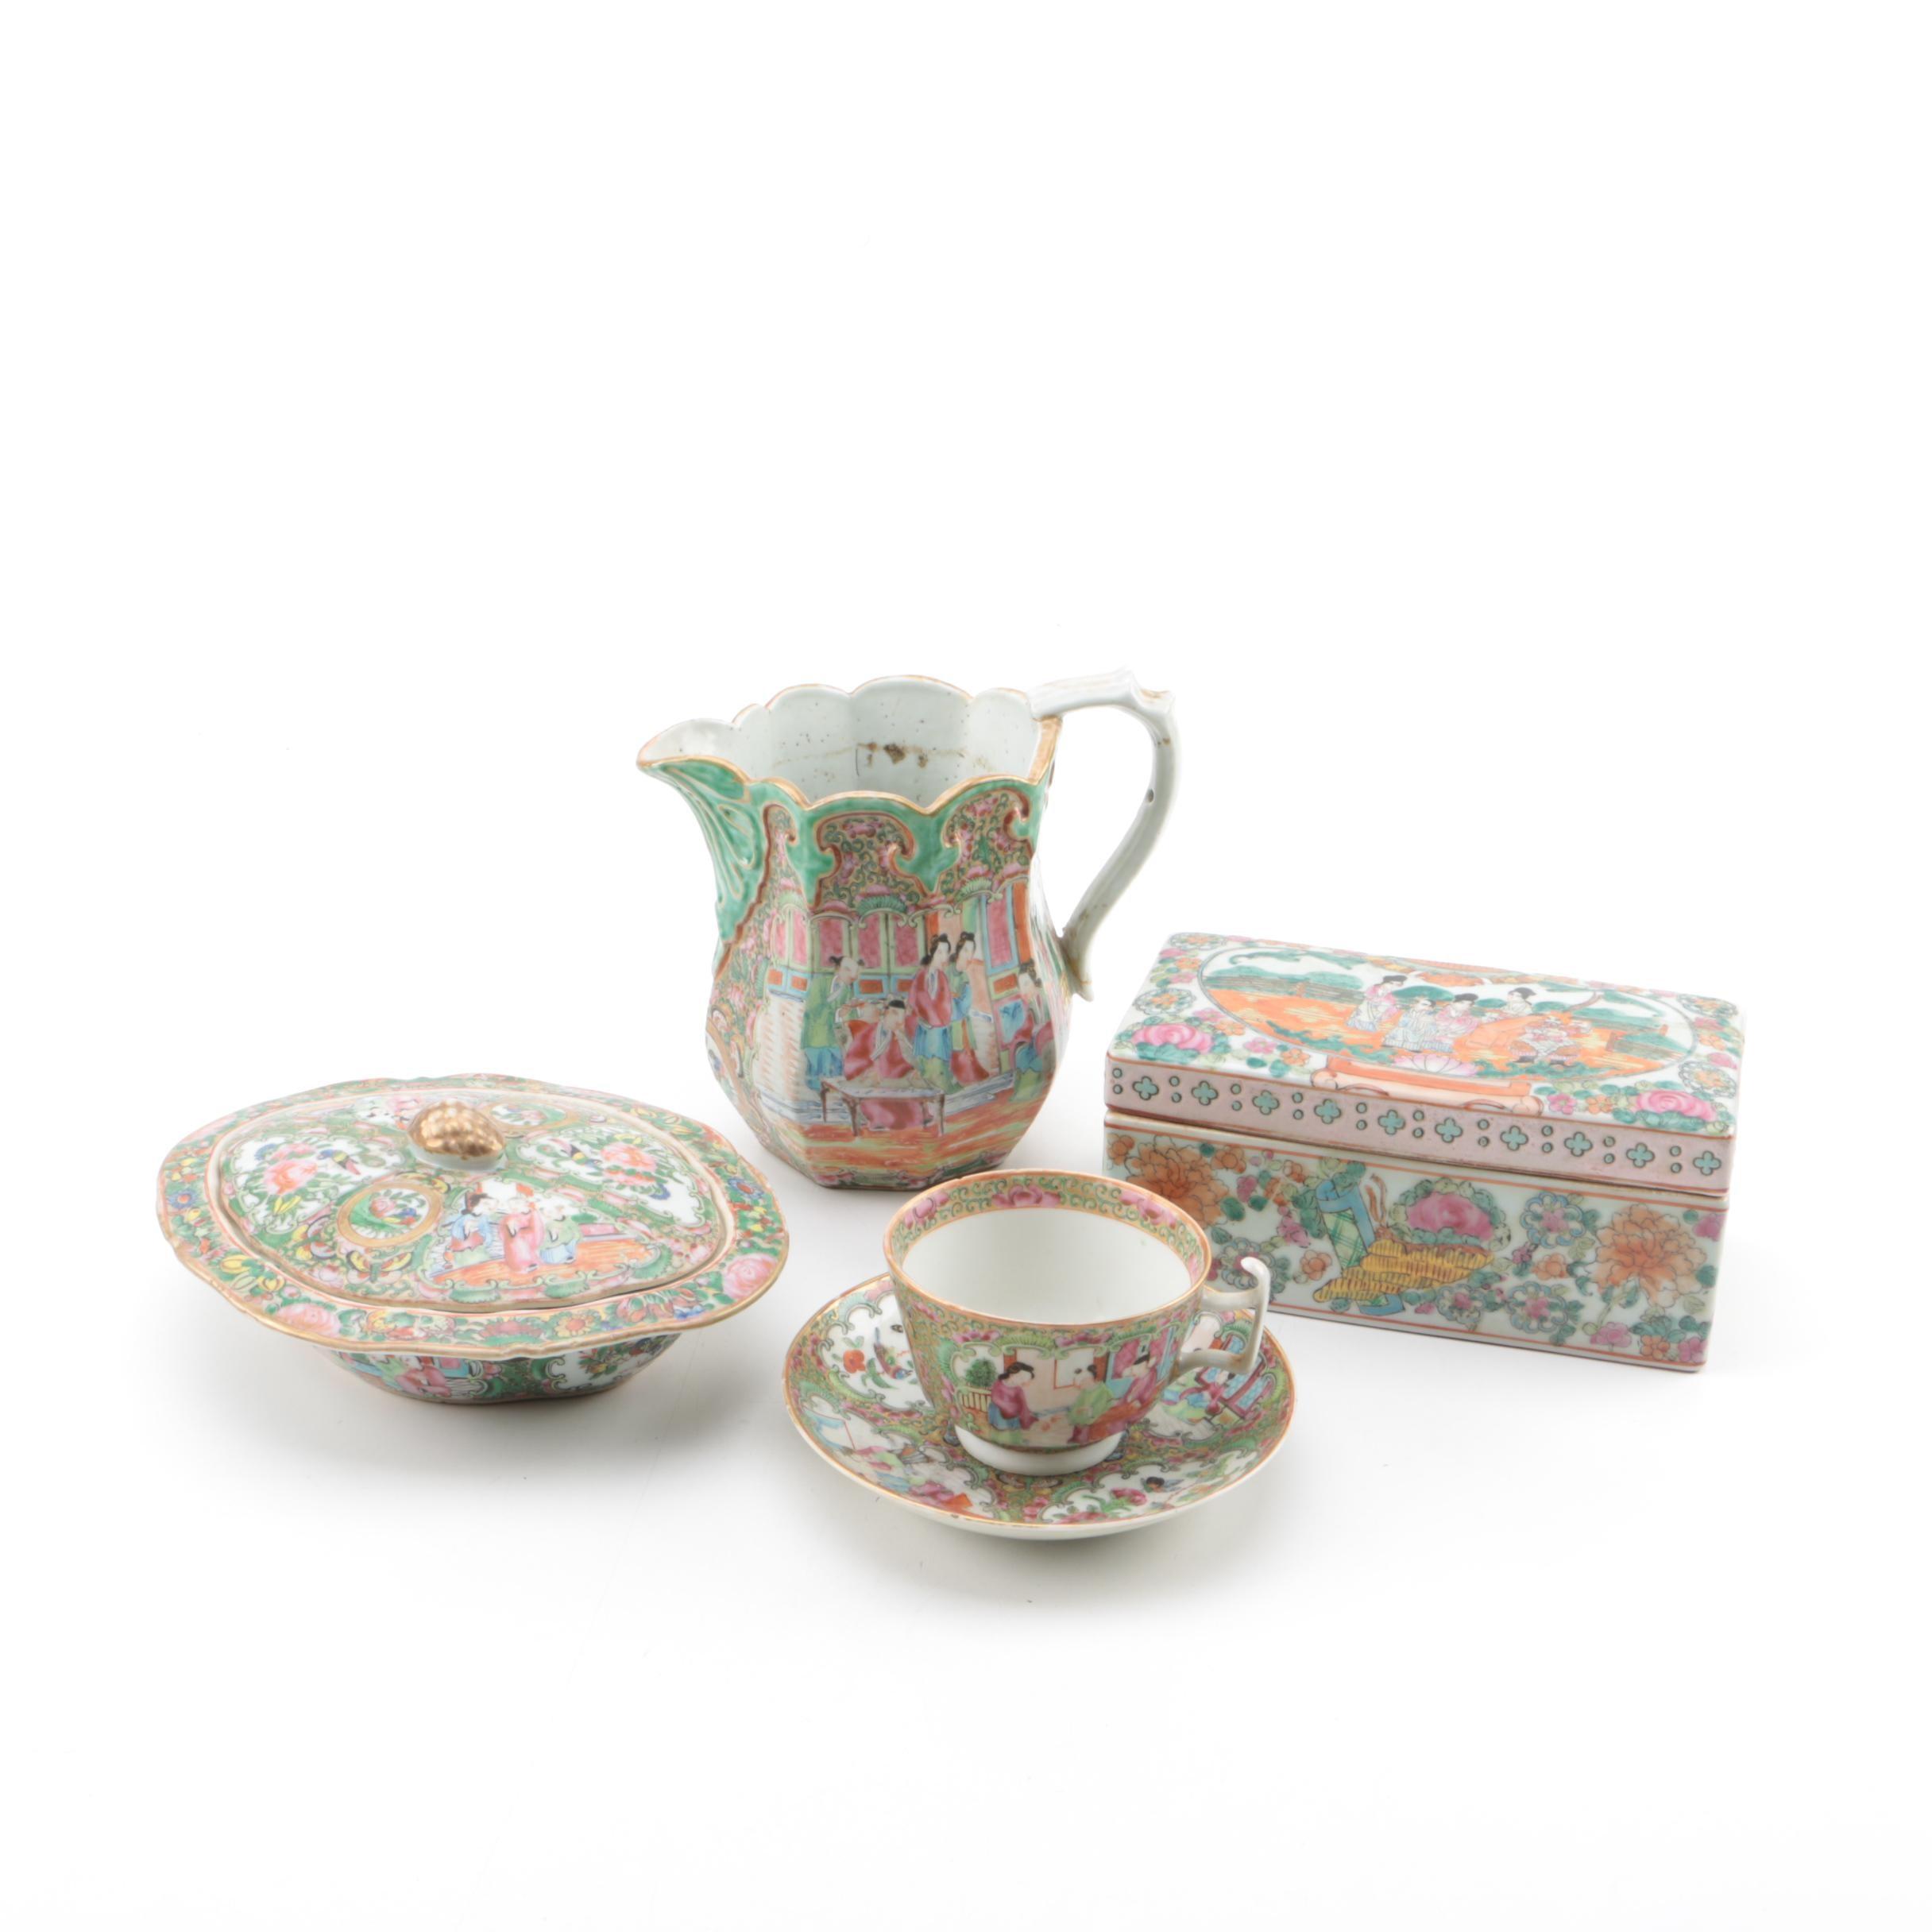 Chinese Rose Medallion Porcelain Tableware and Trinket Box